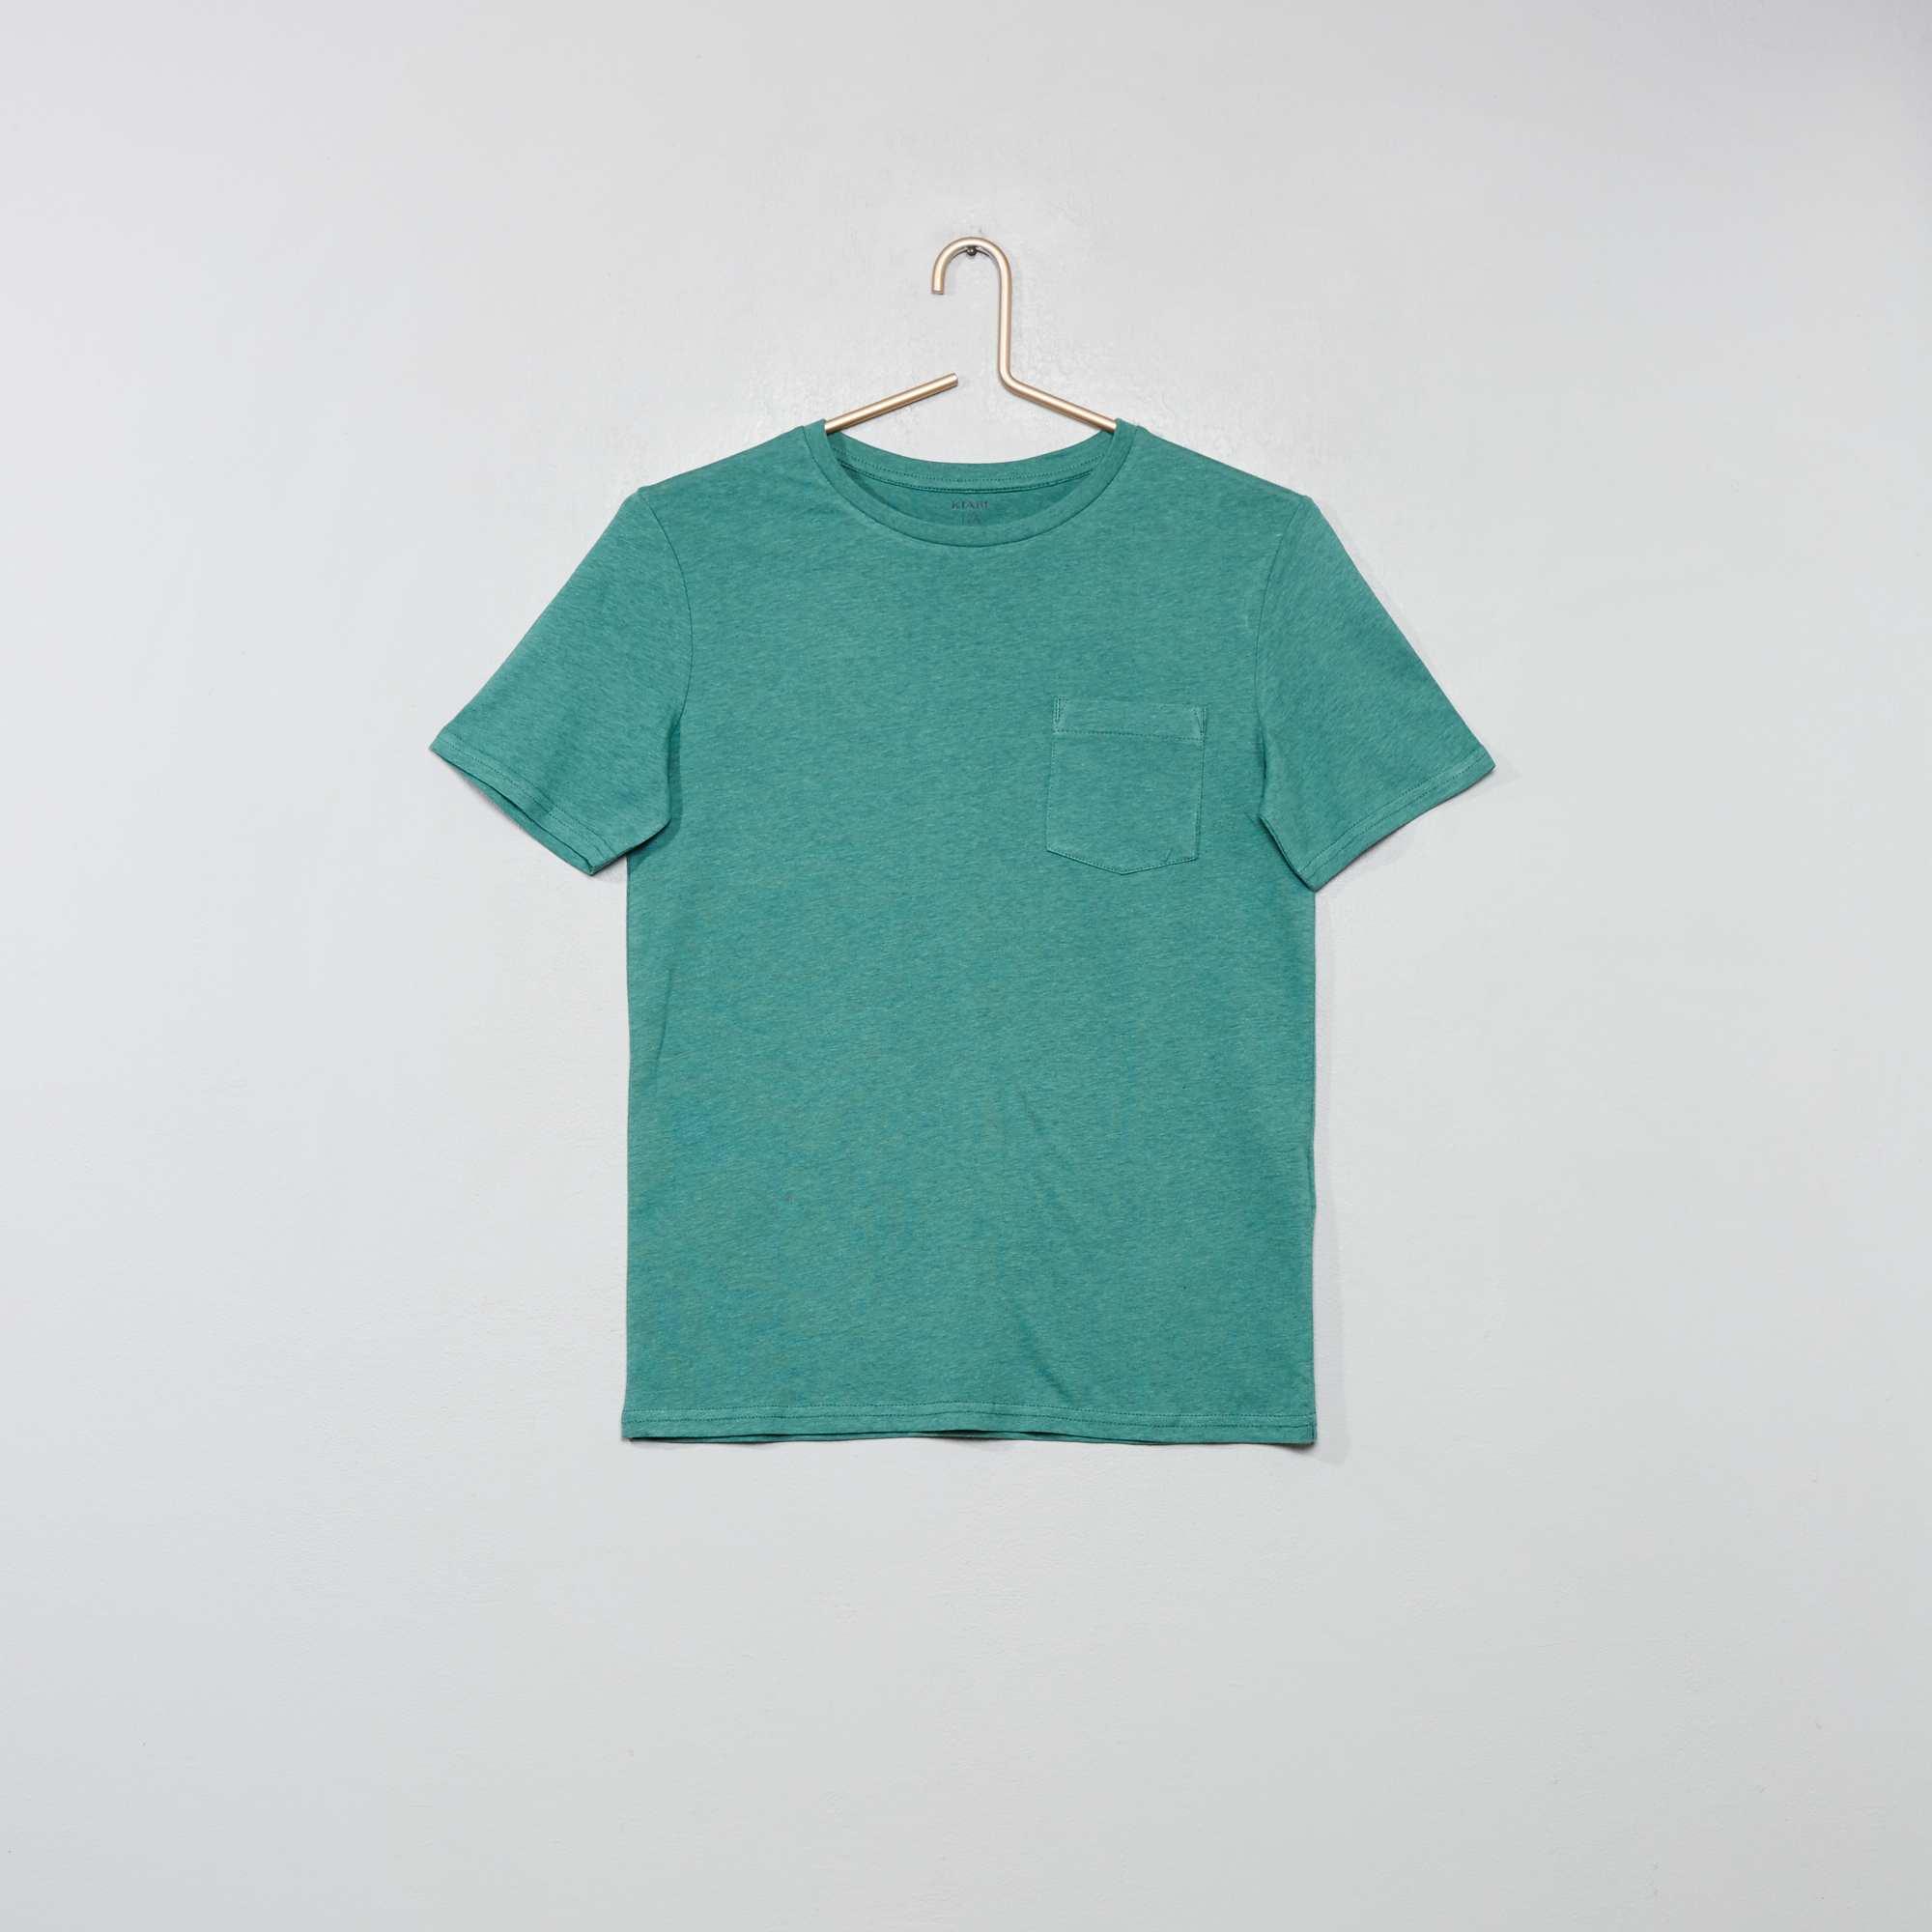 4139cbe53 Camiseta básica Joven niño - KAKI - Kiabi - 3